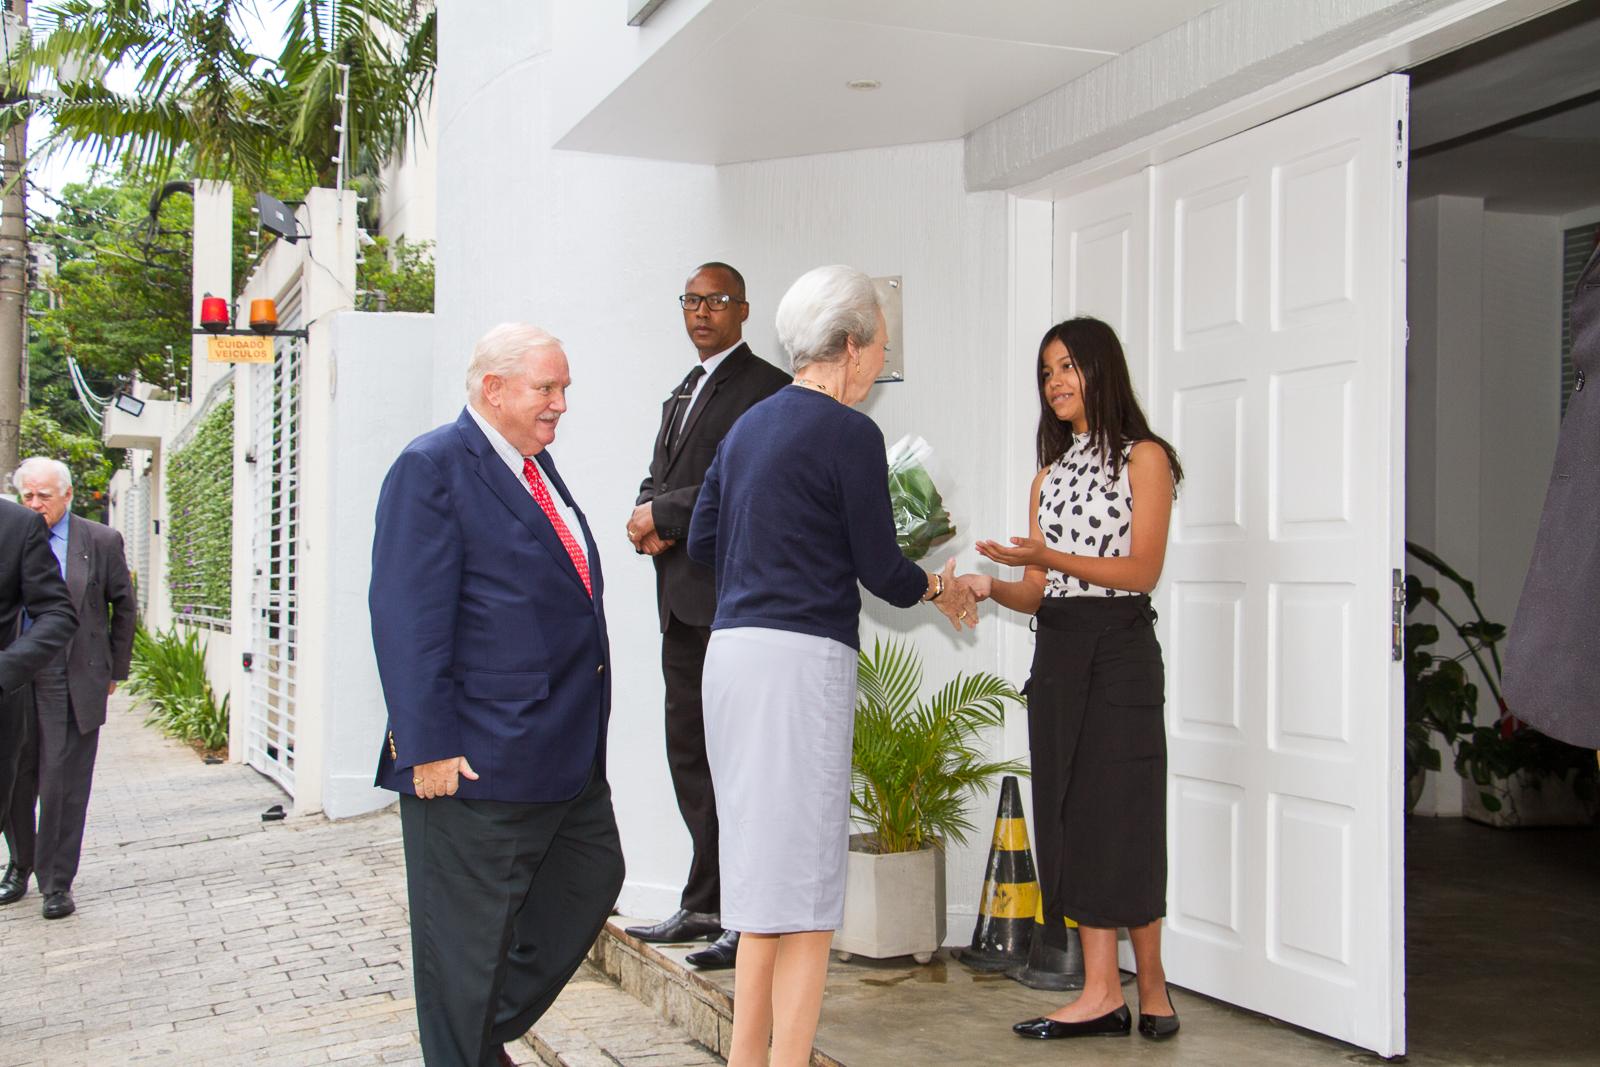 Cegada da princesa na visita da Princesa Benedikte da Dinamarca no Brasil